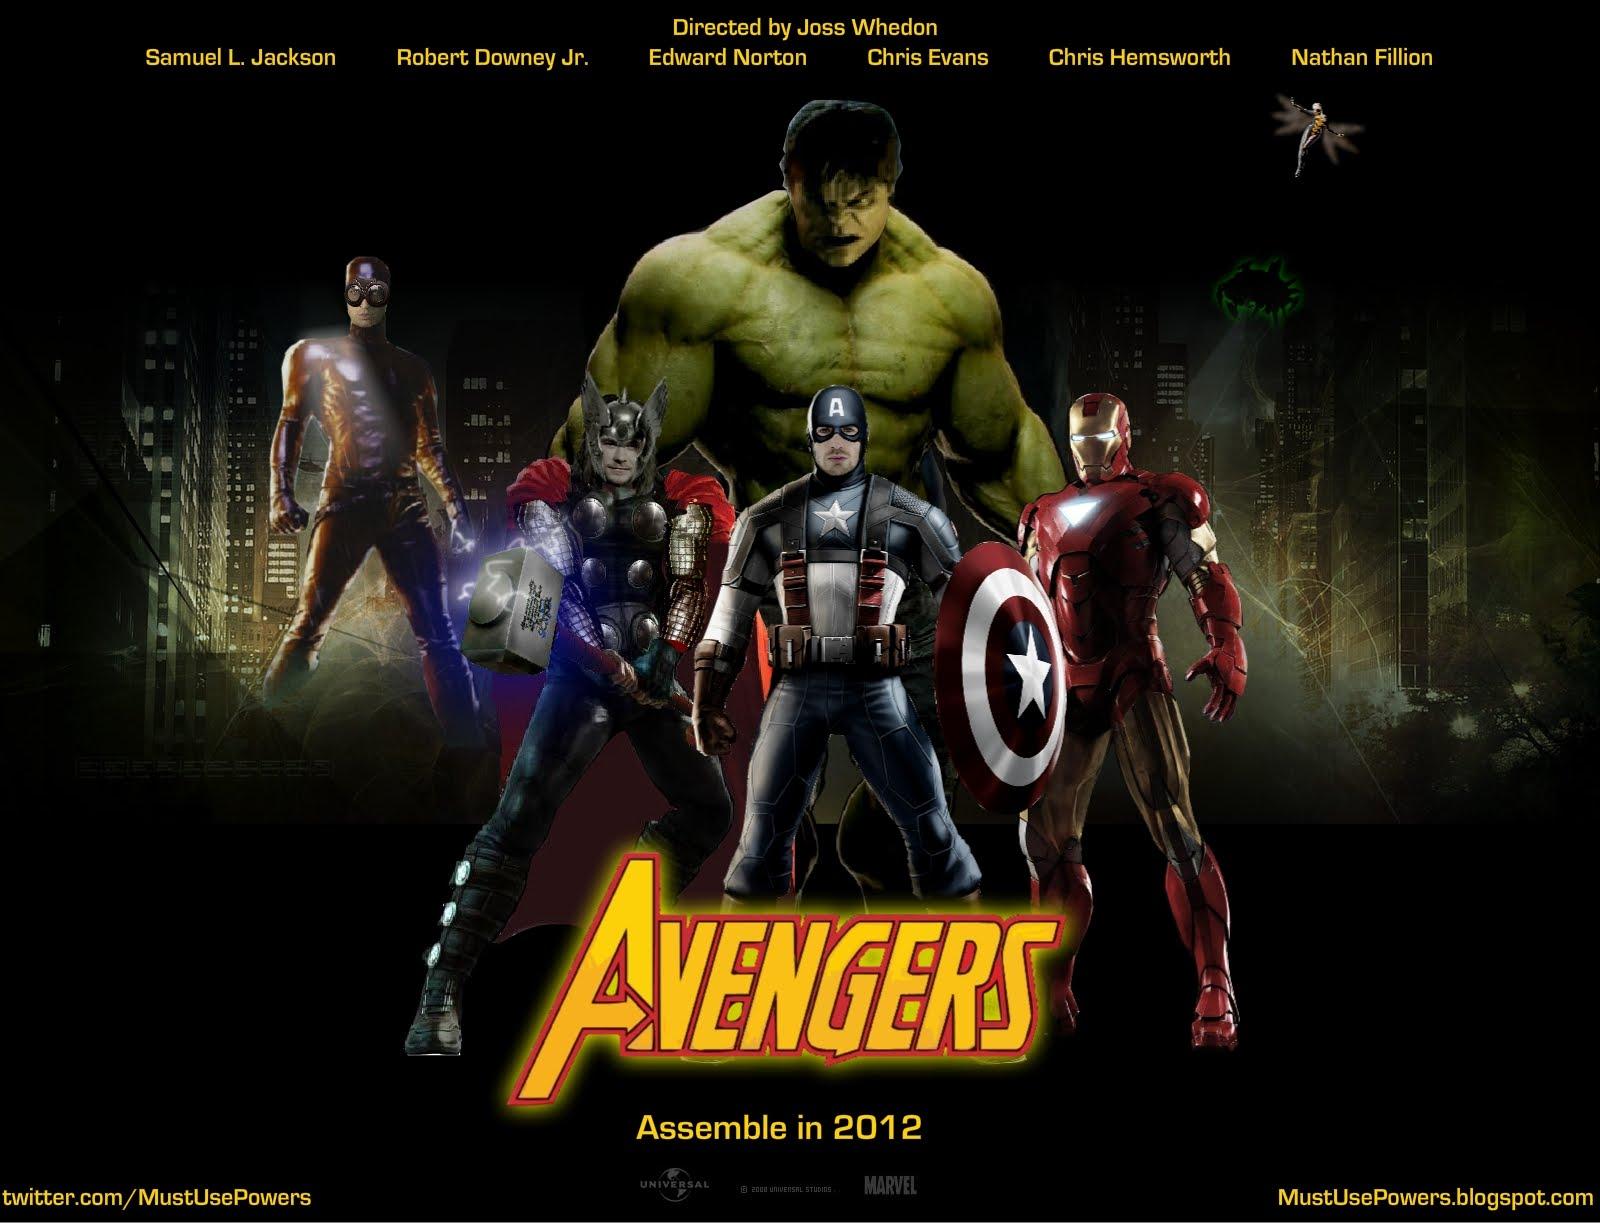 http://2.bp.blogspot.com/_t-Dy2G2jvCI/TAcBM885vDI/AAAAAAAAAUs/98uoBtbH6VI/s1600/avengers-billboard-6.jpg